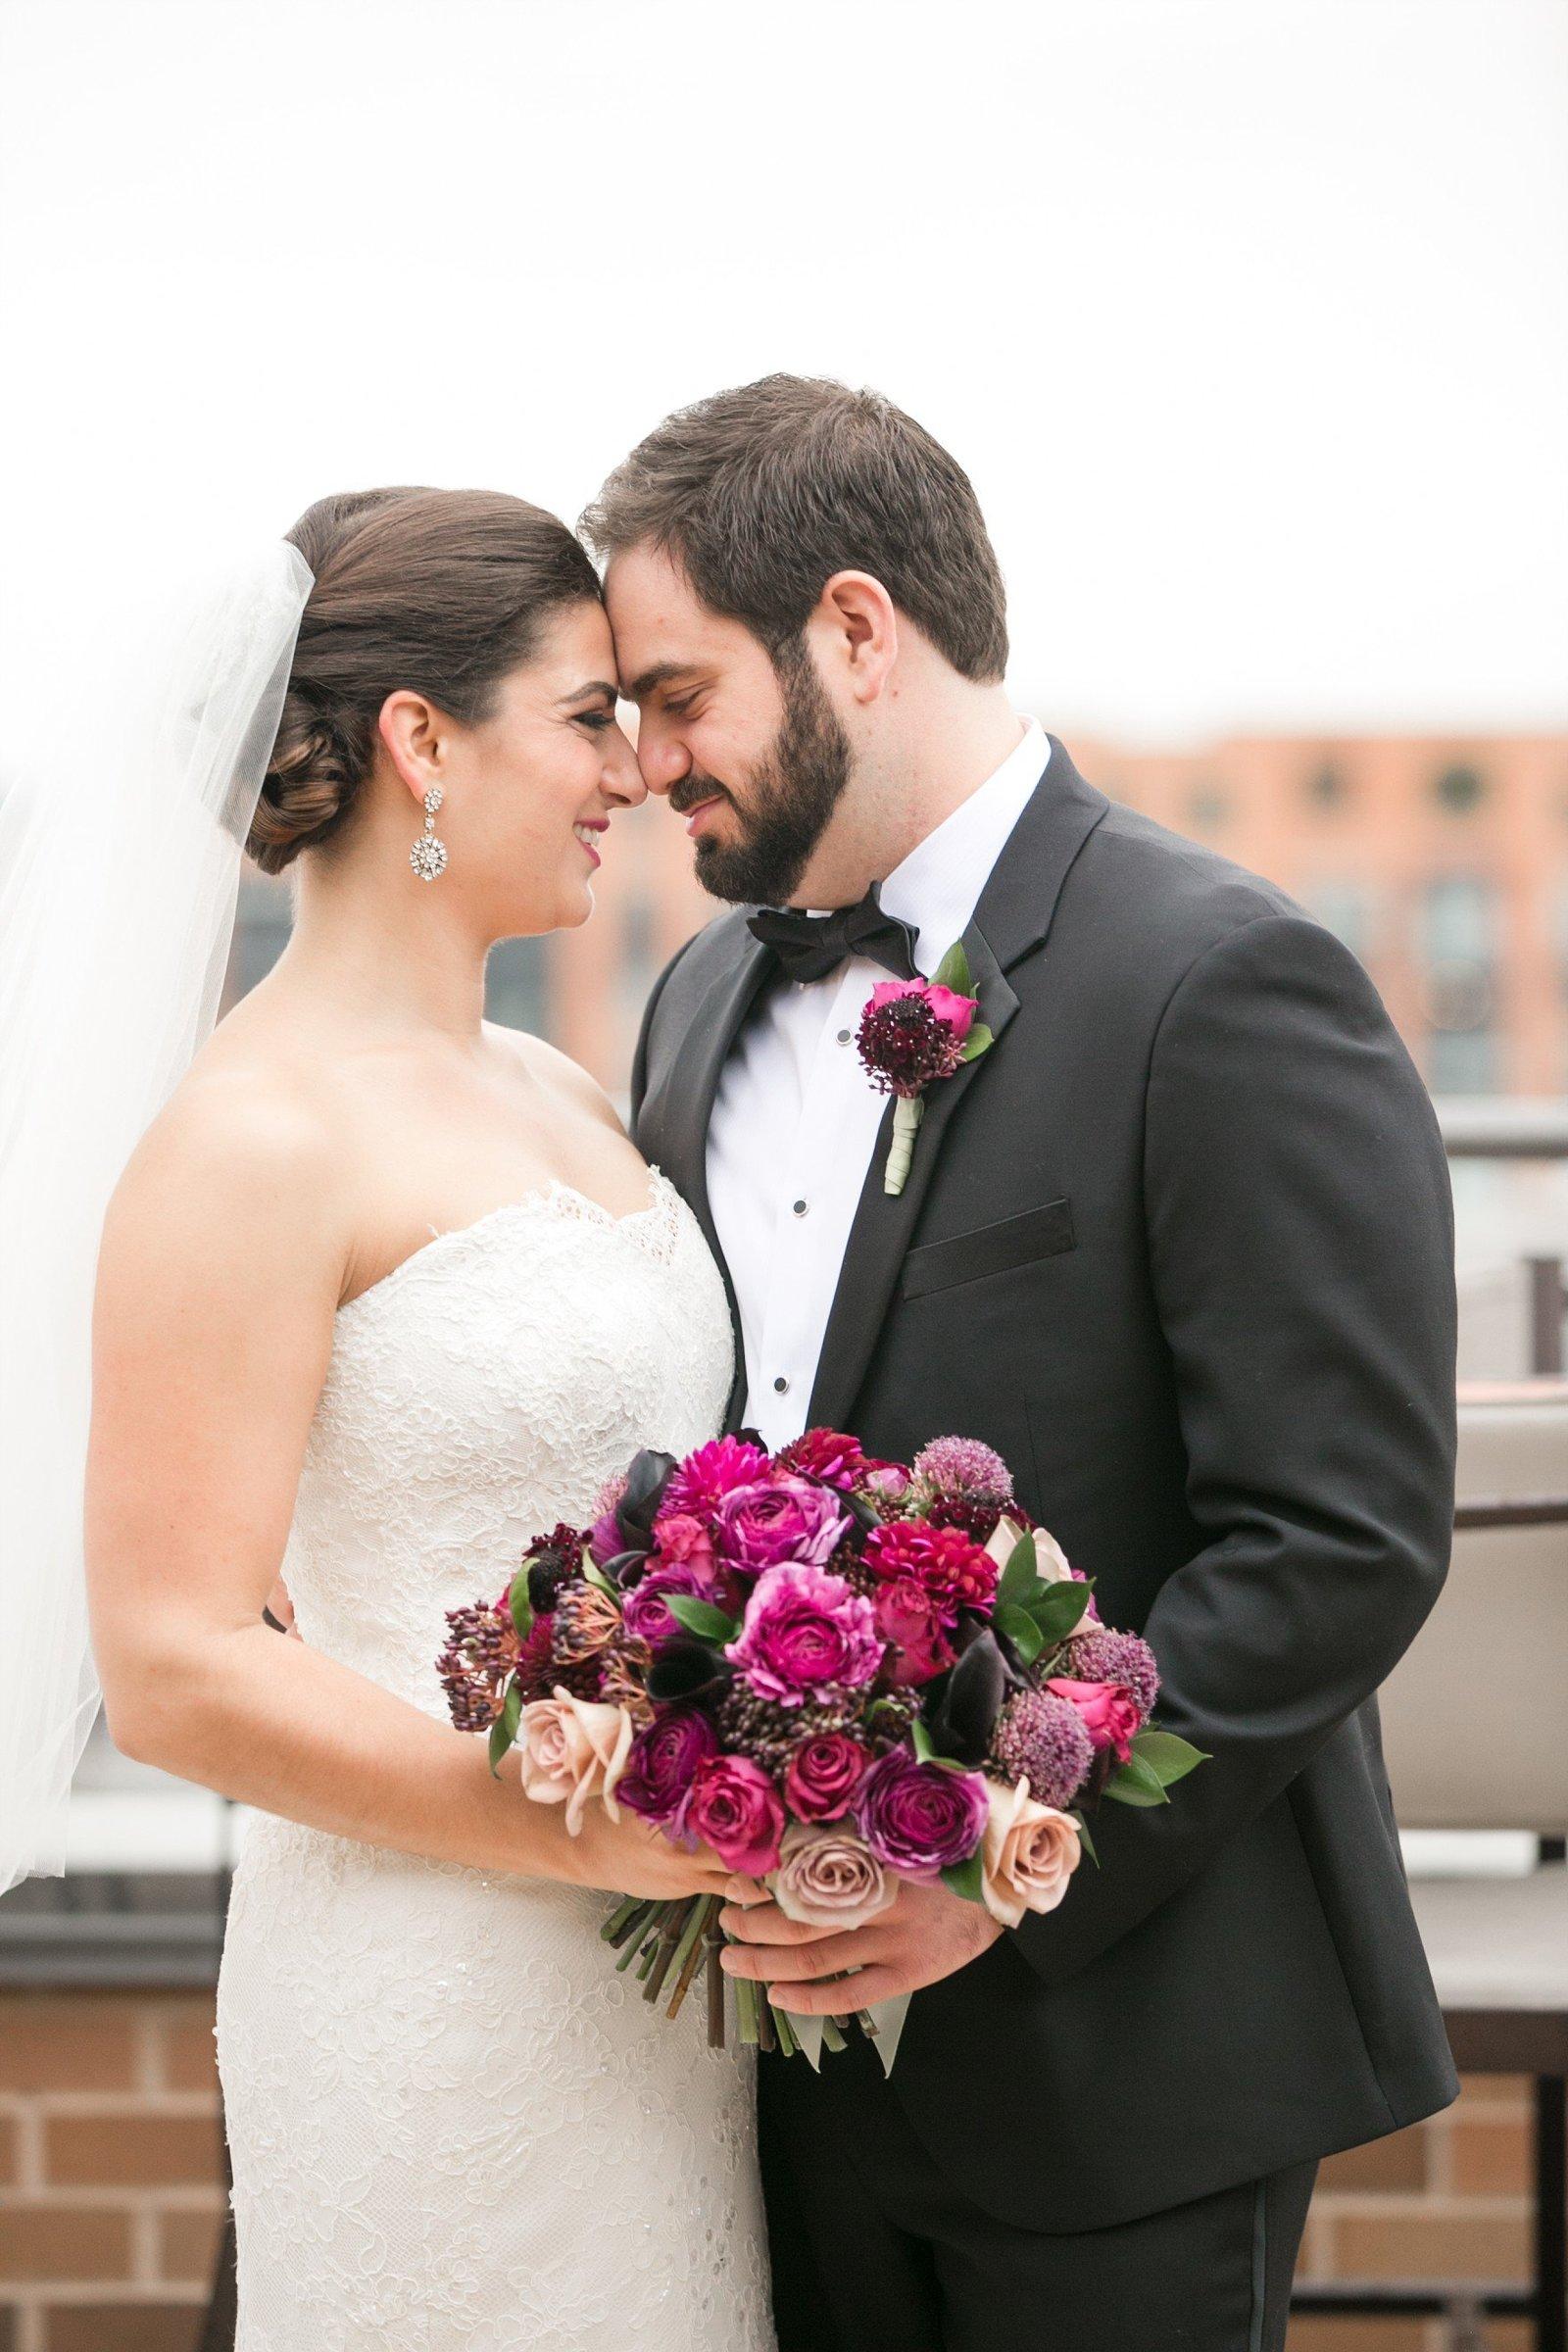 Black-tie-wedding-photos-longview-gallery-dc (137)